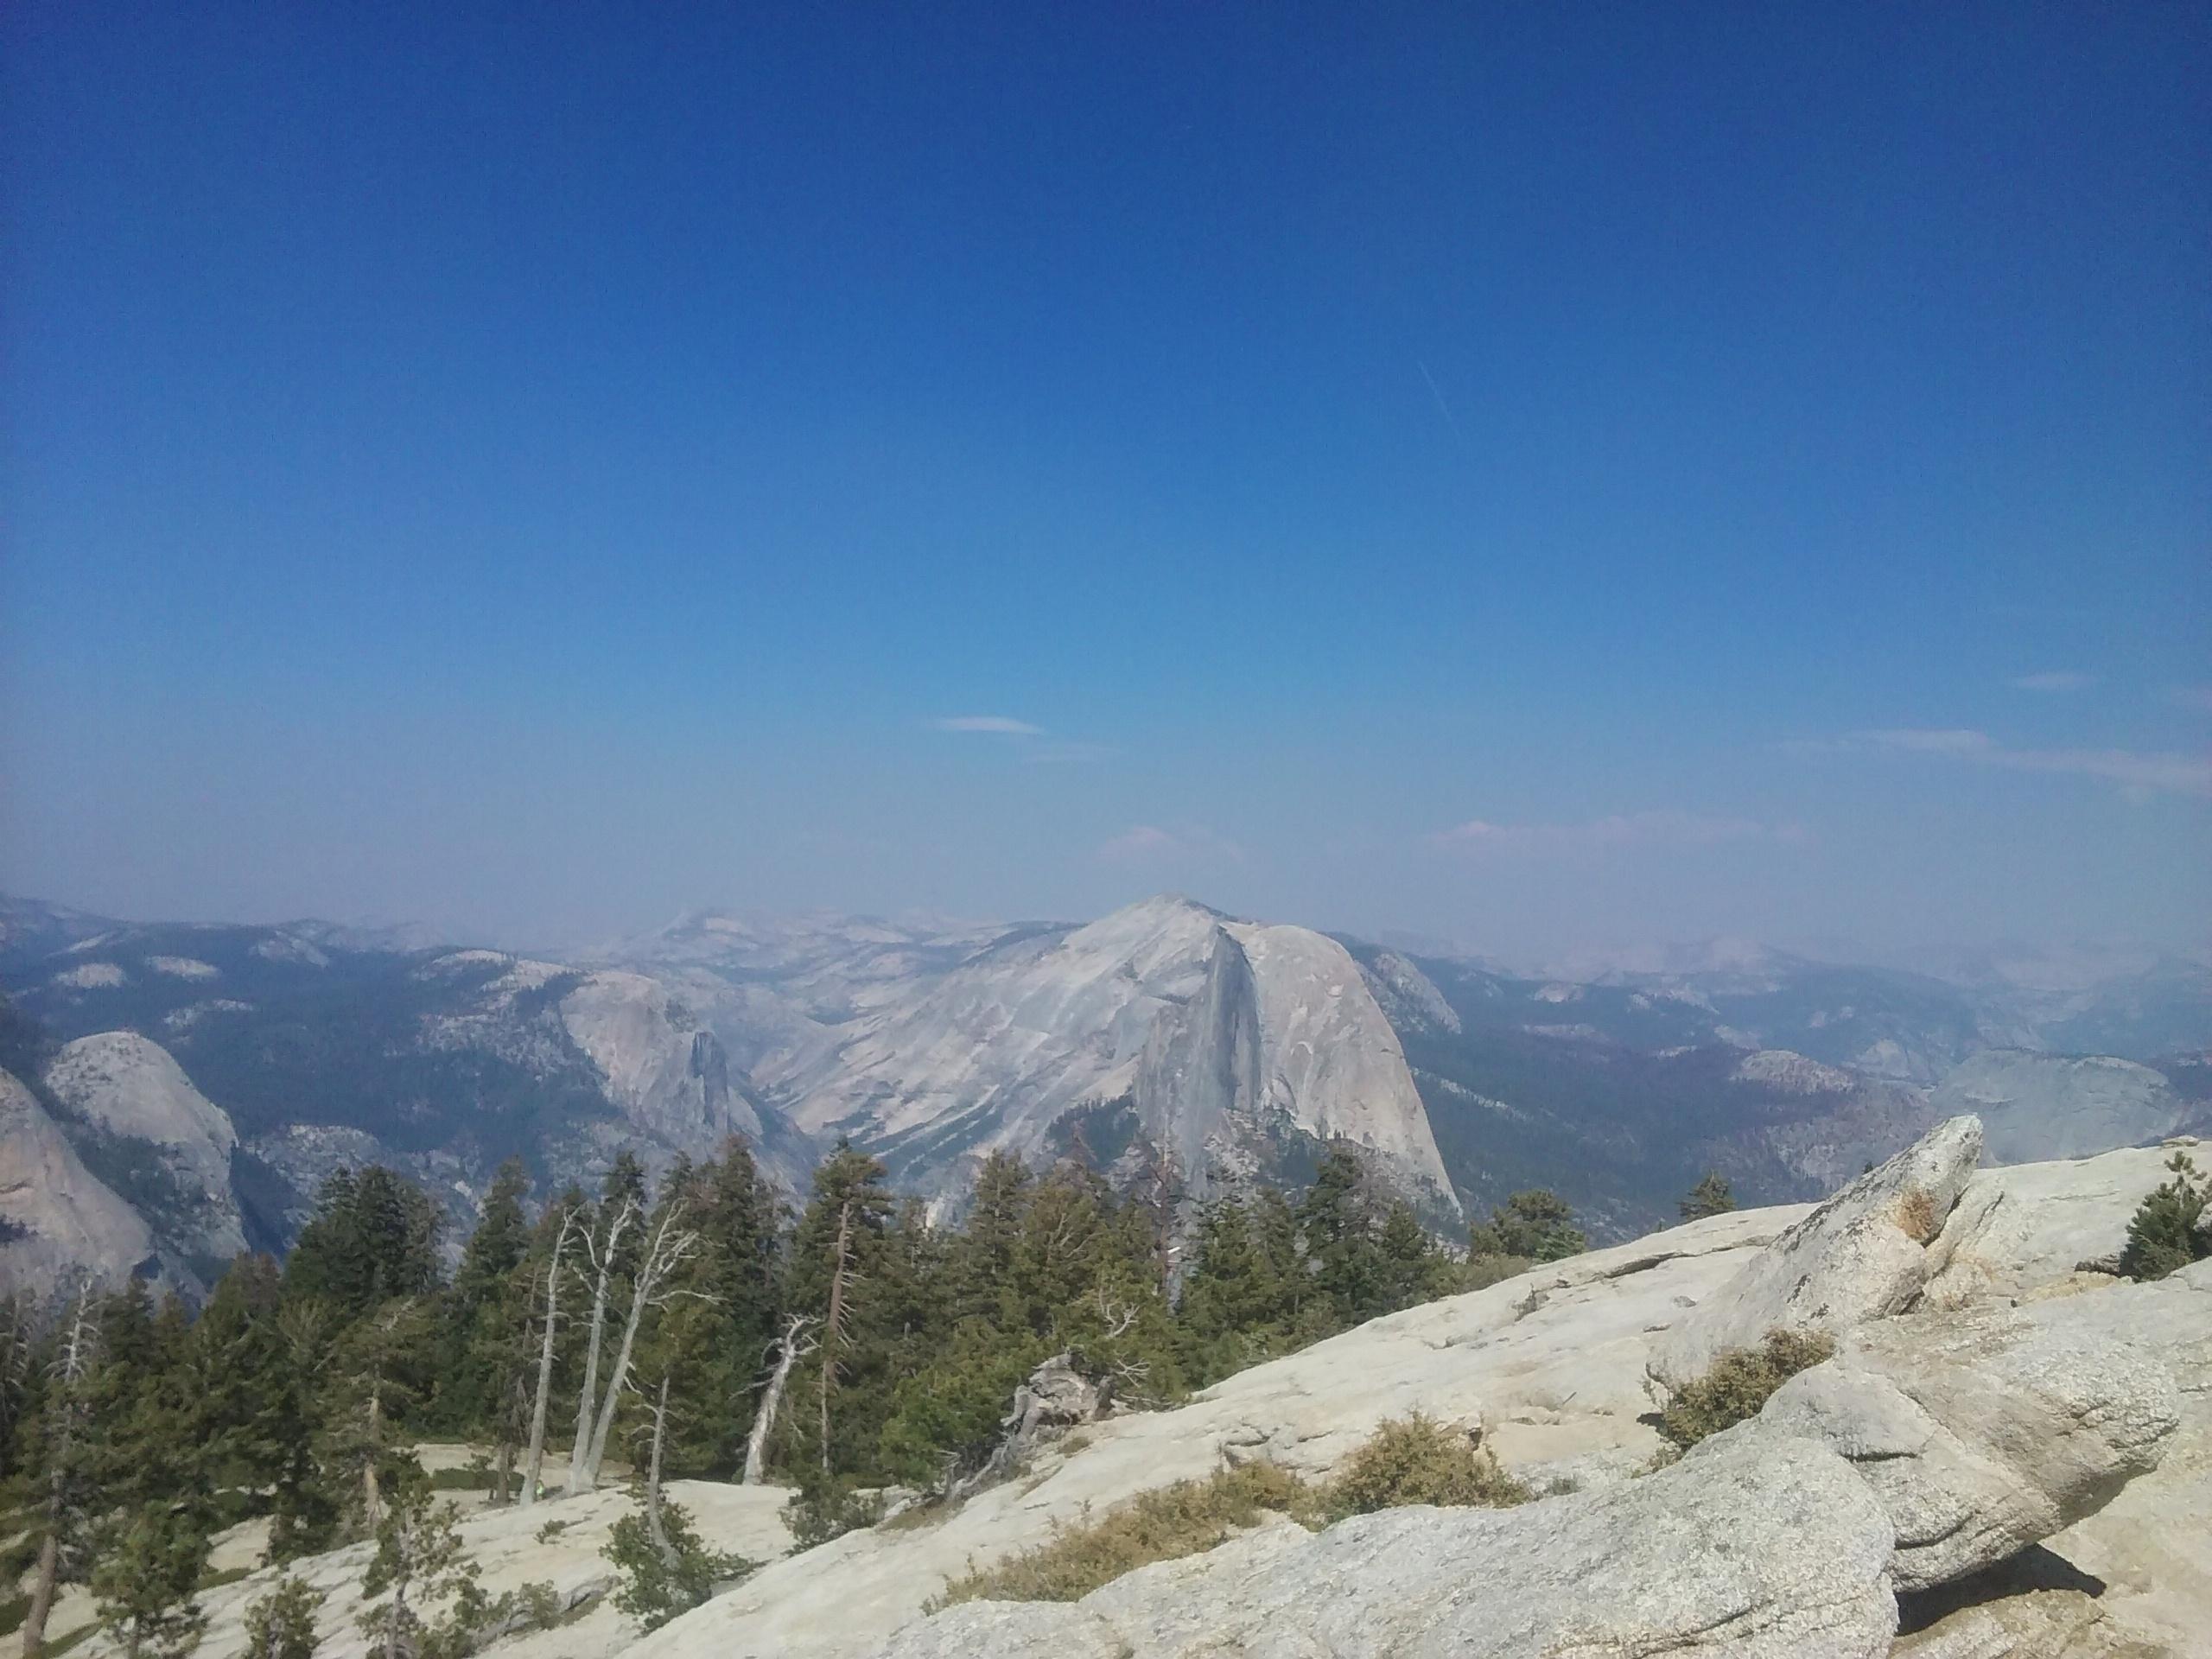 Yosemite!